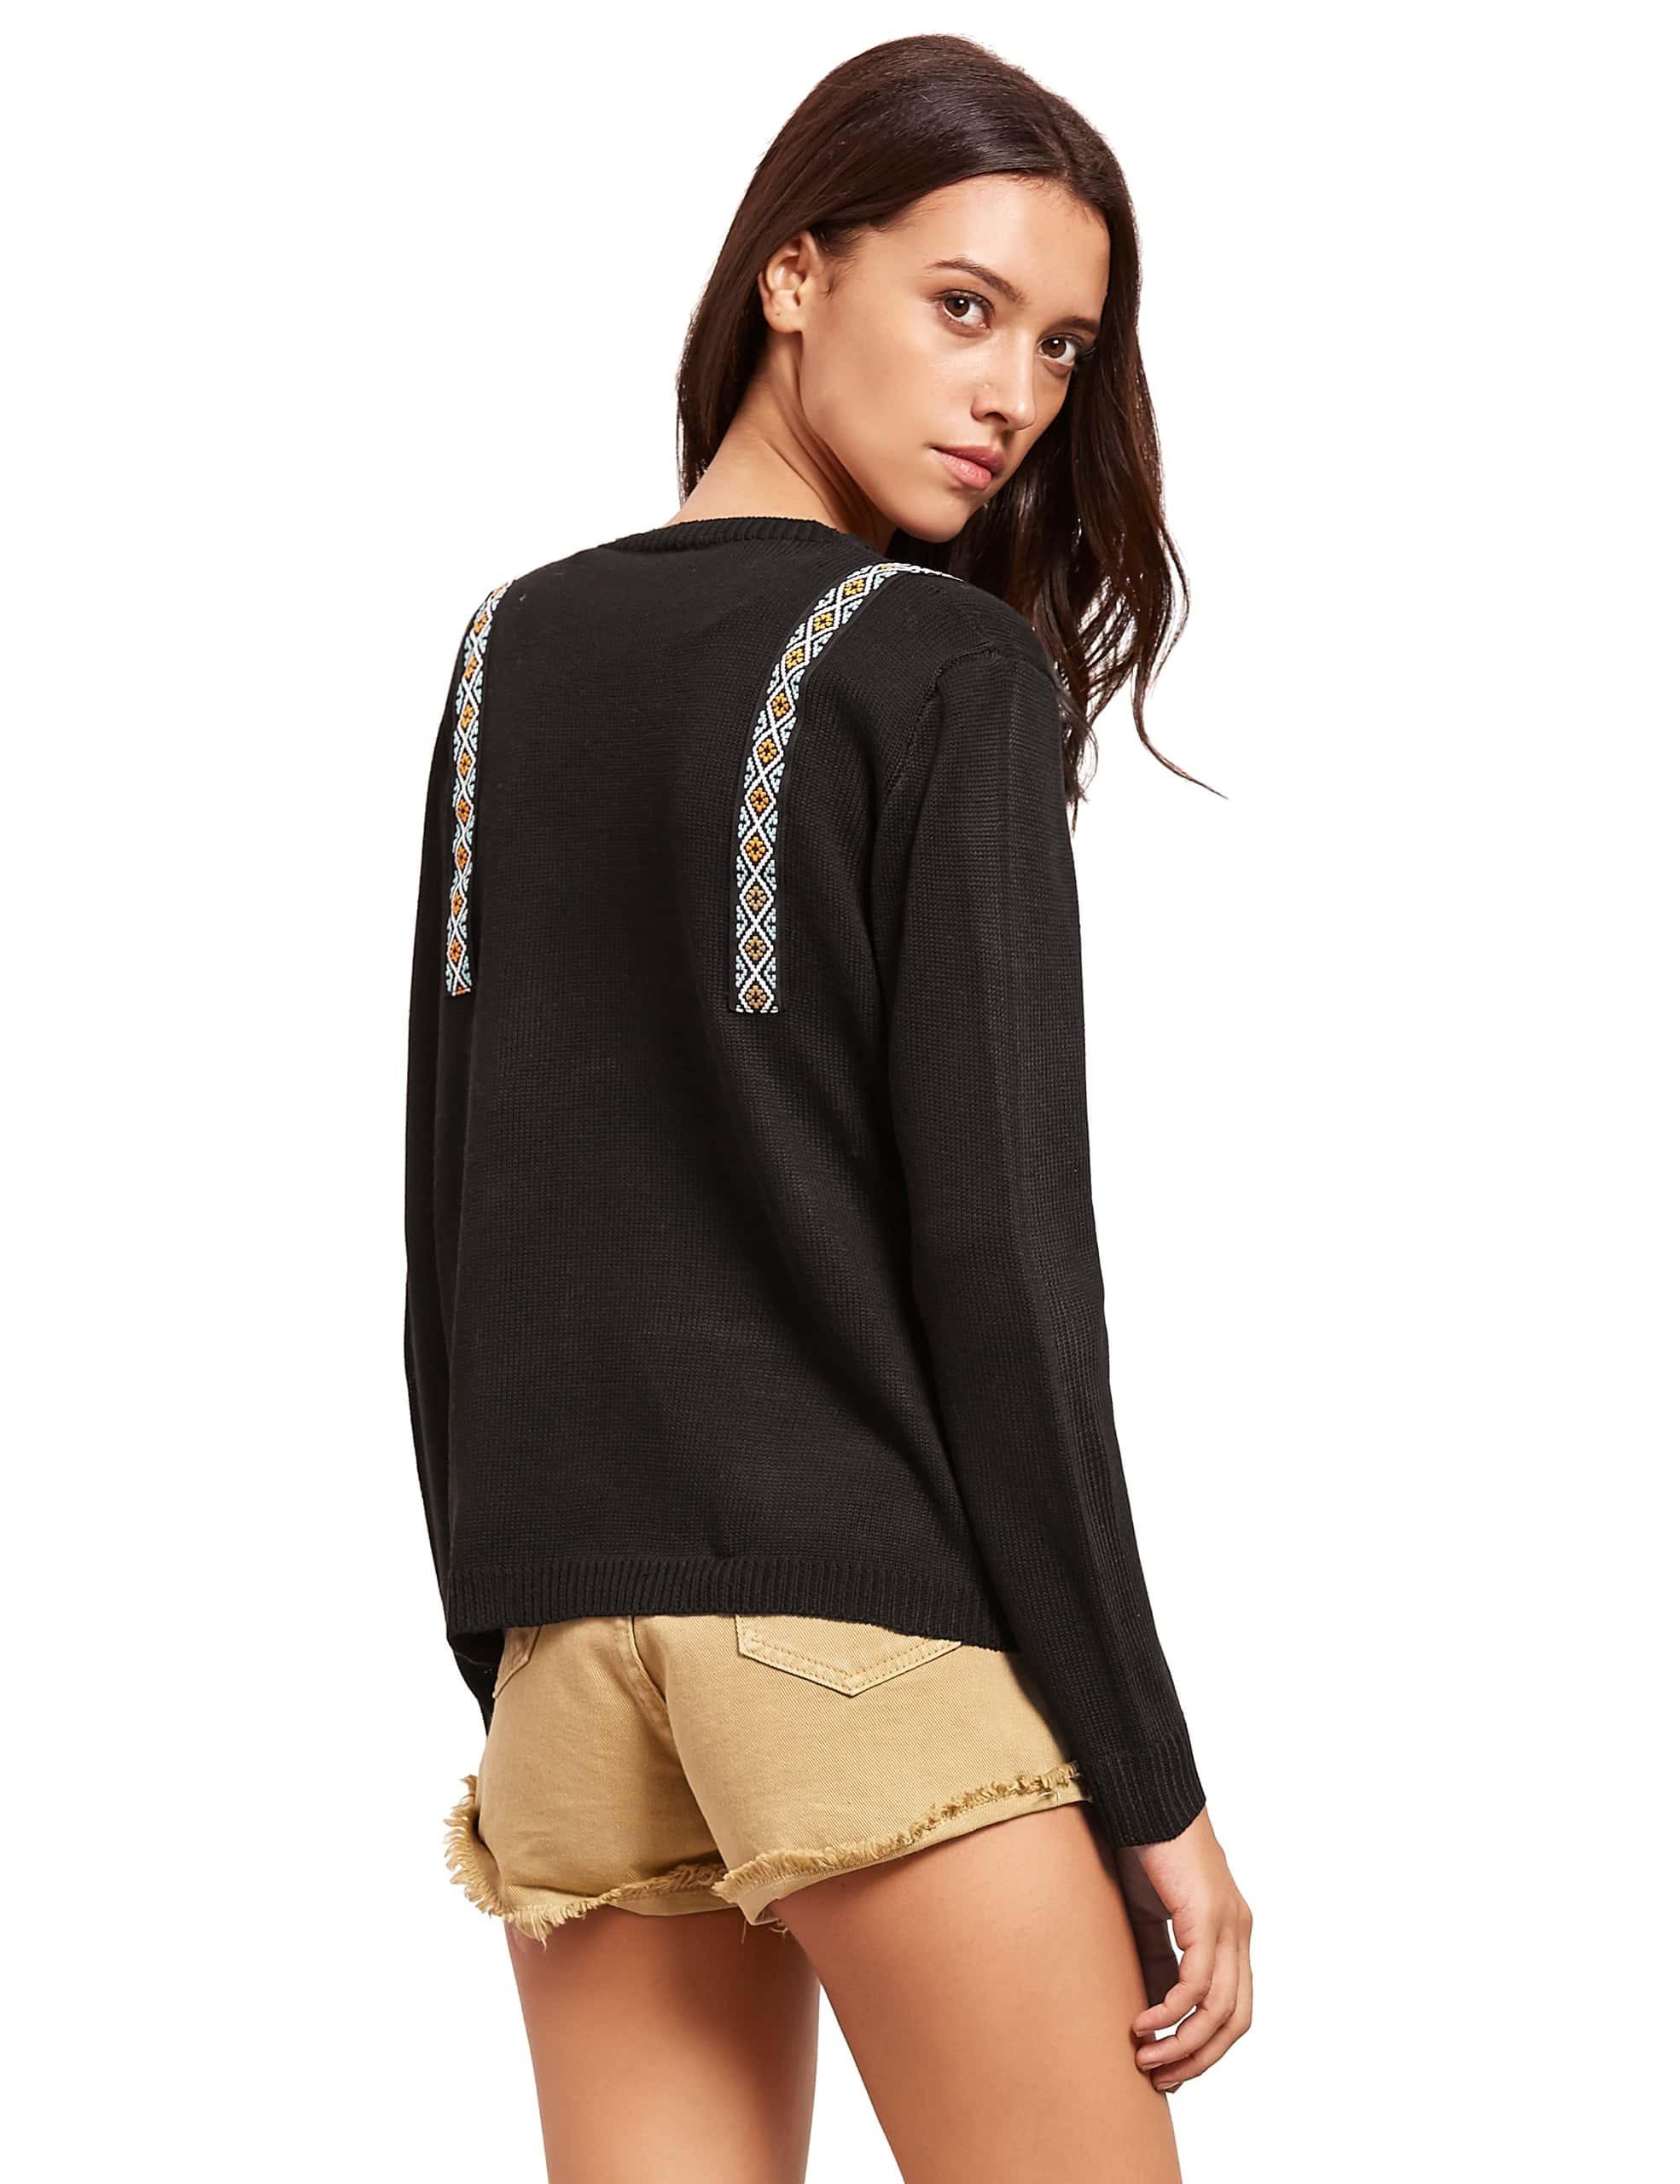 sweater160914487_2